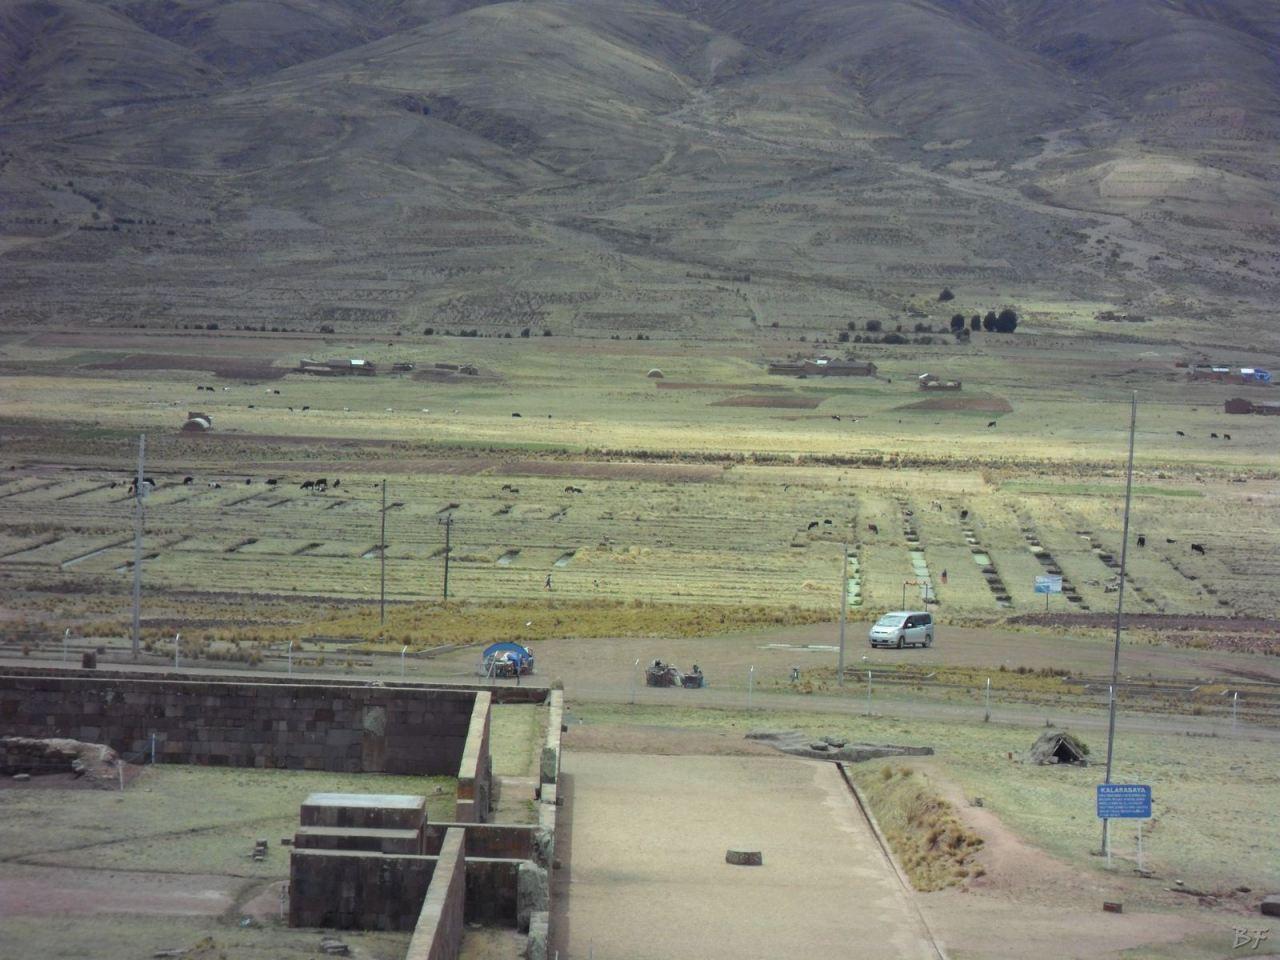 Sito-Megalitico-Piramide-Akapana-Kalasasaya-Menhir-Tiahuanaco-Bolivia-127